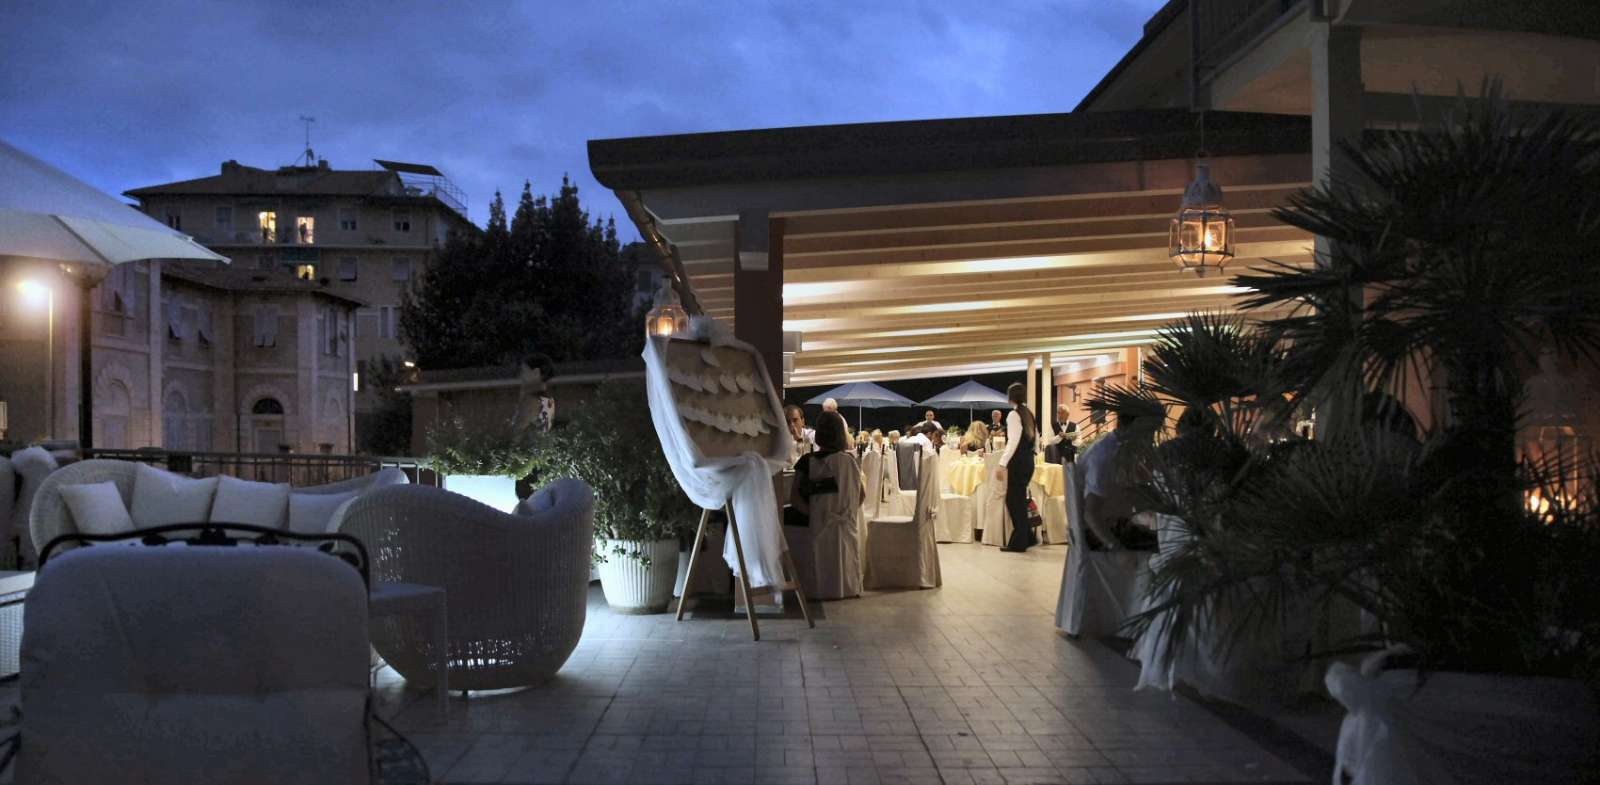 La terrasse, agréable en soirée